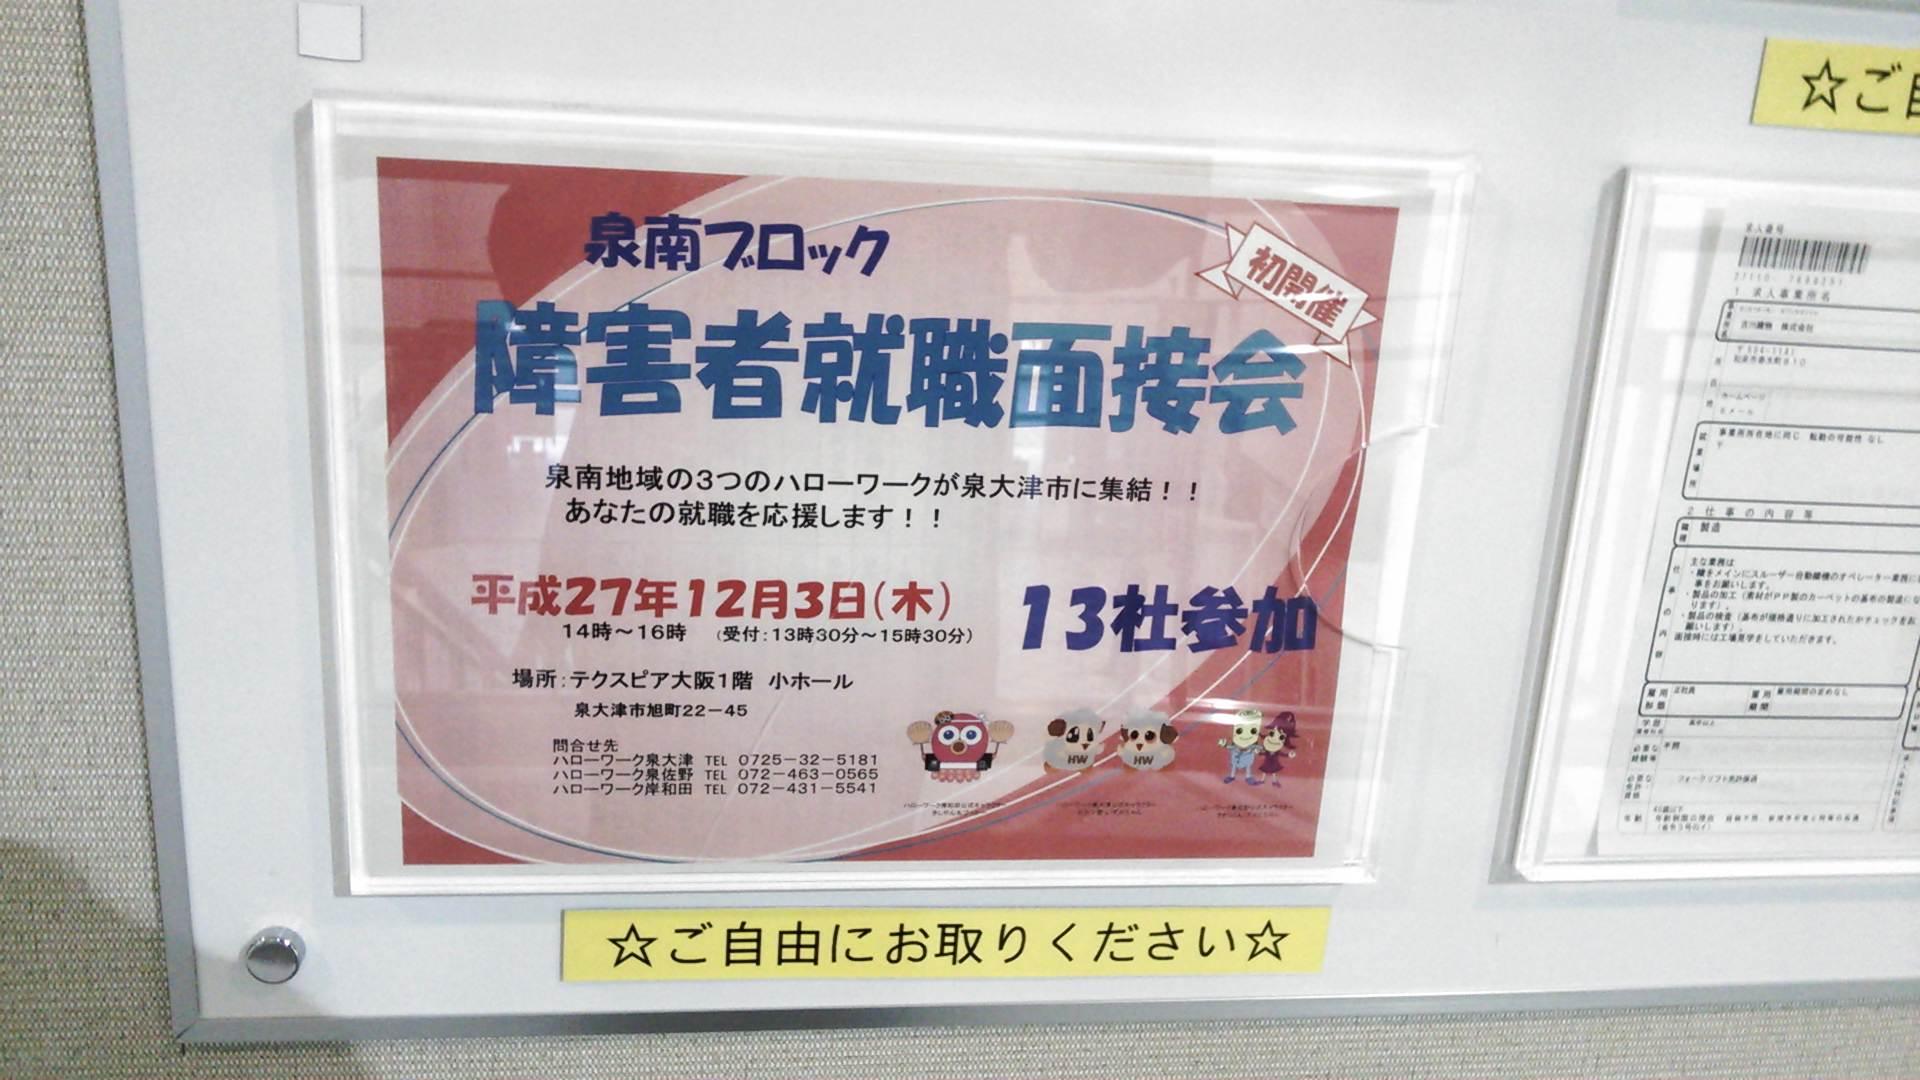 泉北就職情報フェア…泉大津